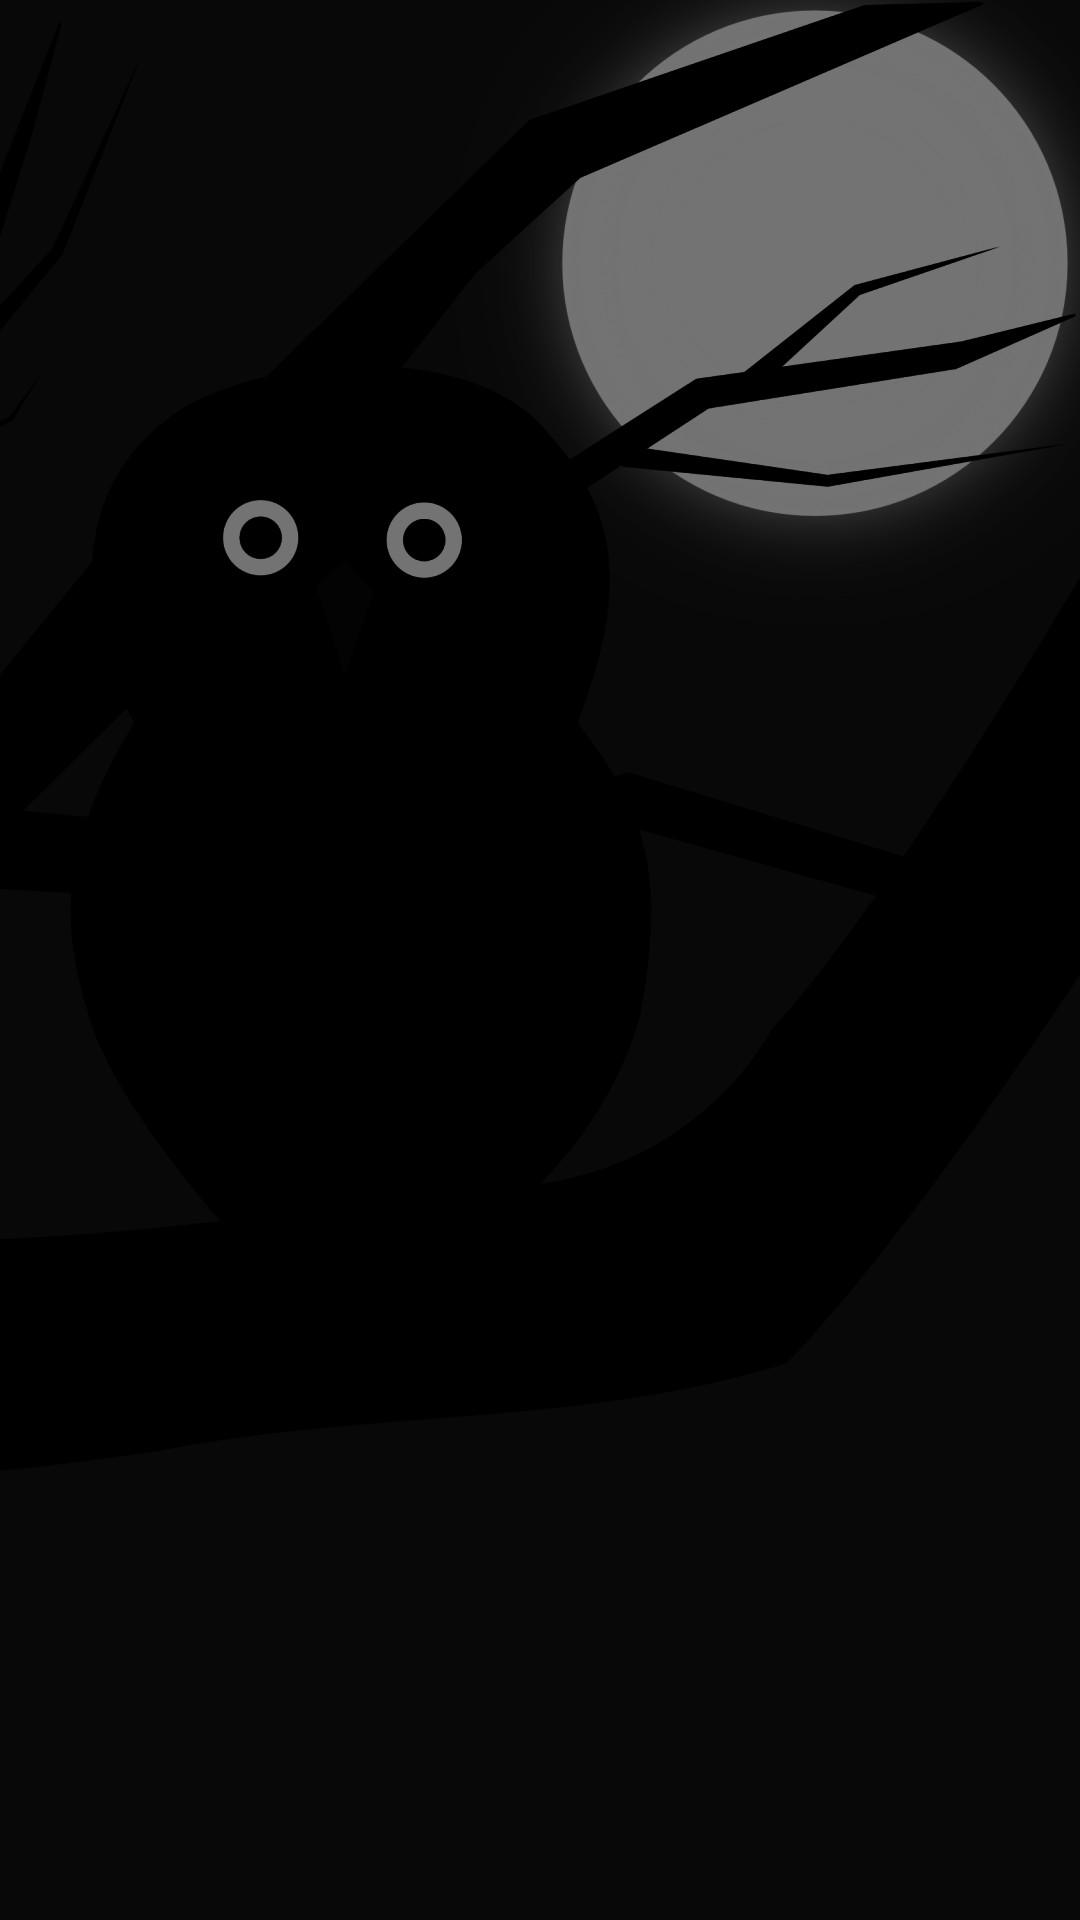 1080x1920 Iphone Wallpaper Black Owl Wallpaper Hd 465916 Hd Wallpaper Backgrounds Download